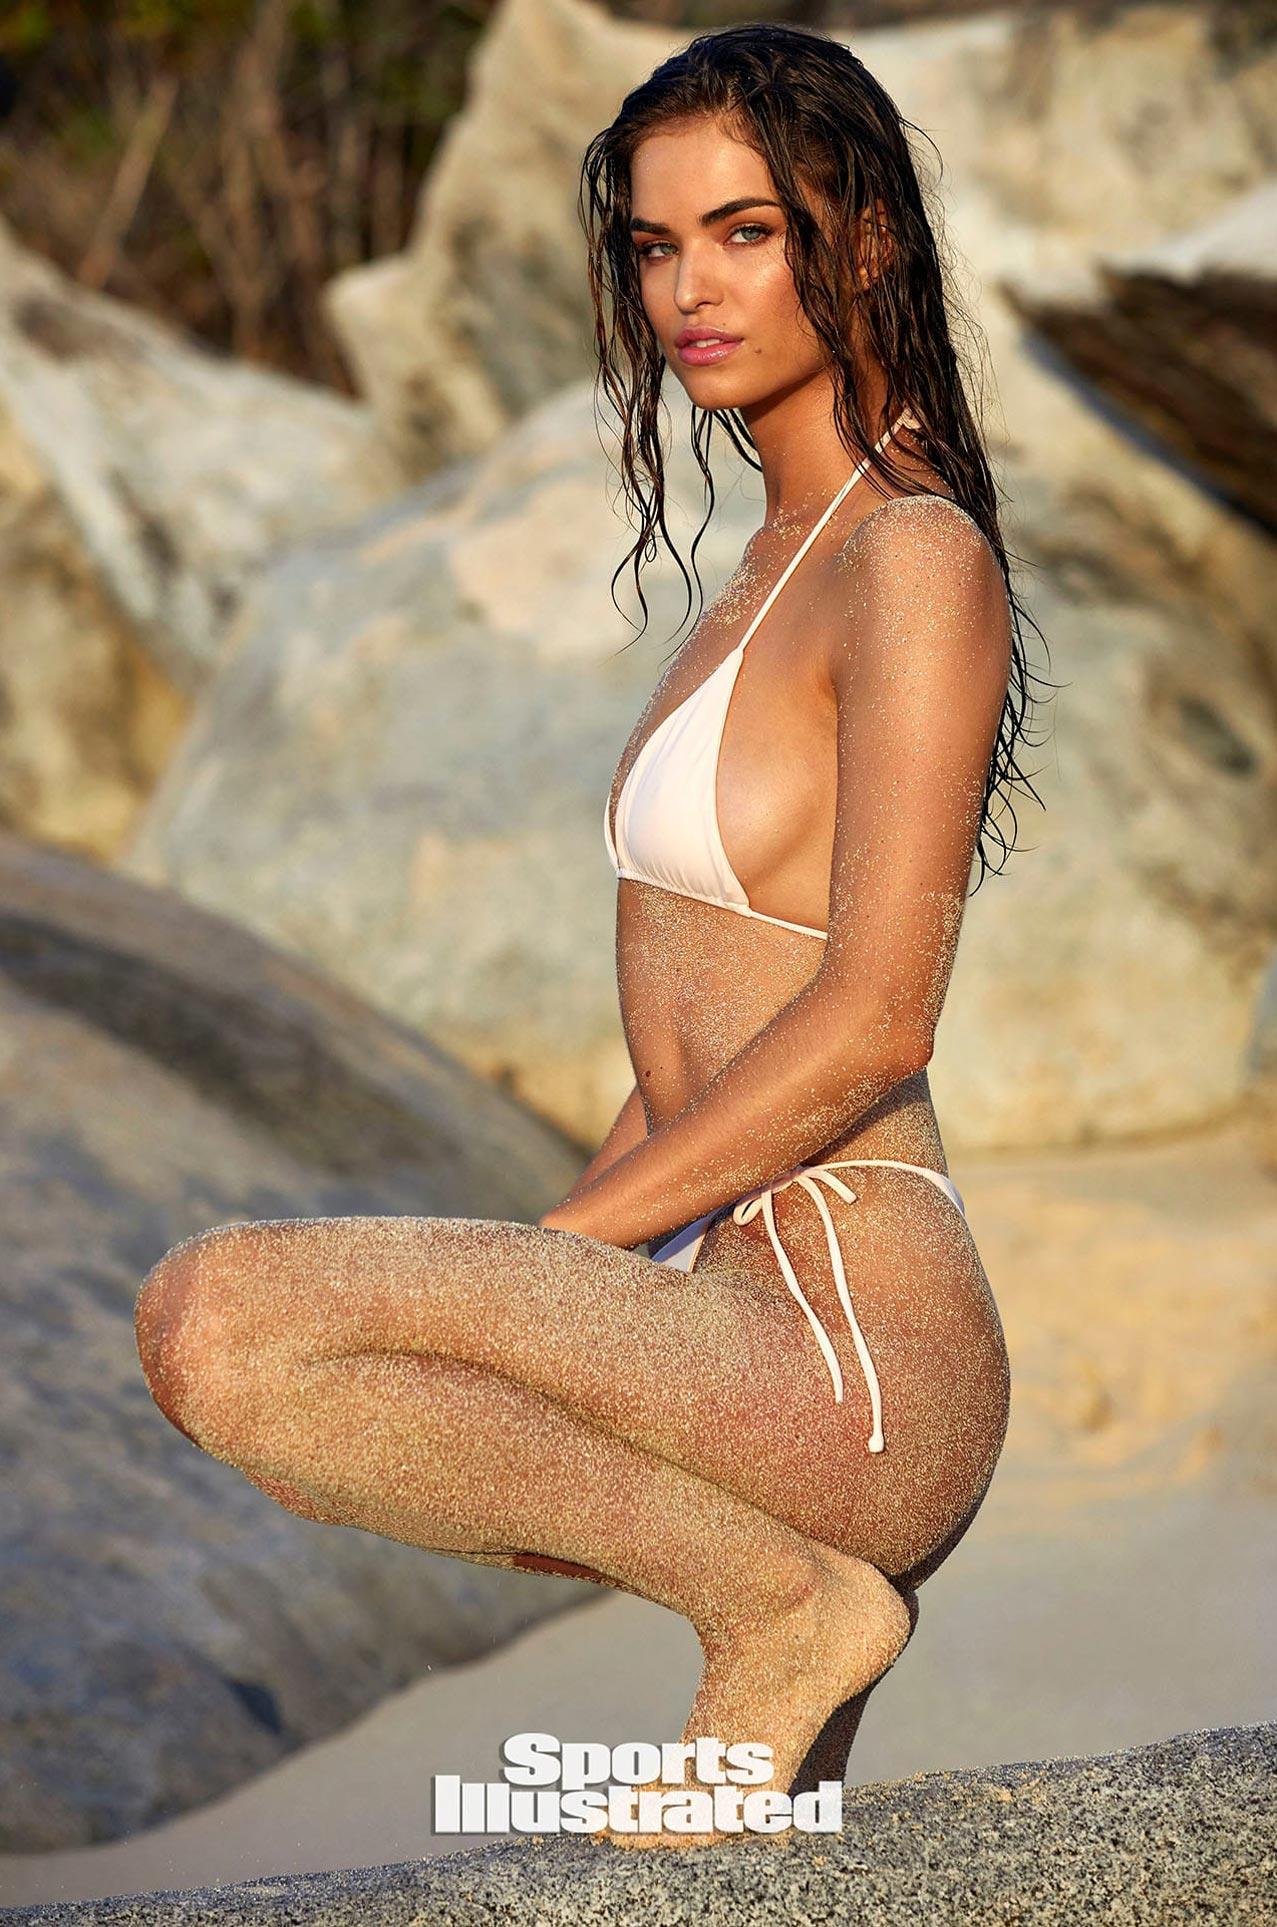 Робин Хольцкен в каталоге купальников Sports Illustrated Swimsuit 2020 / фото 23